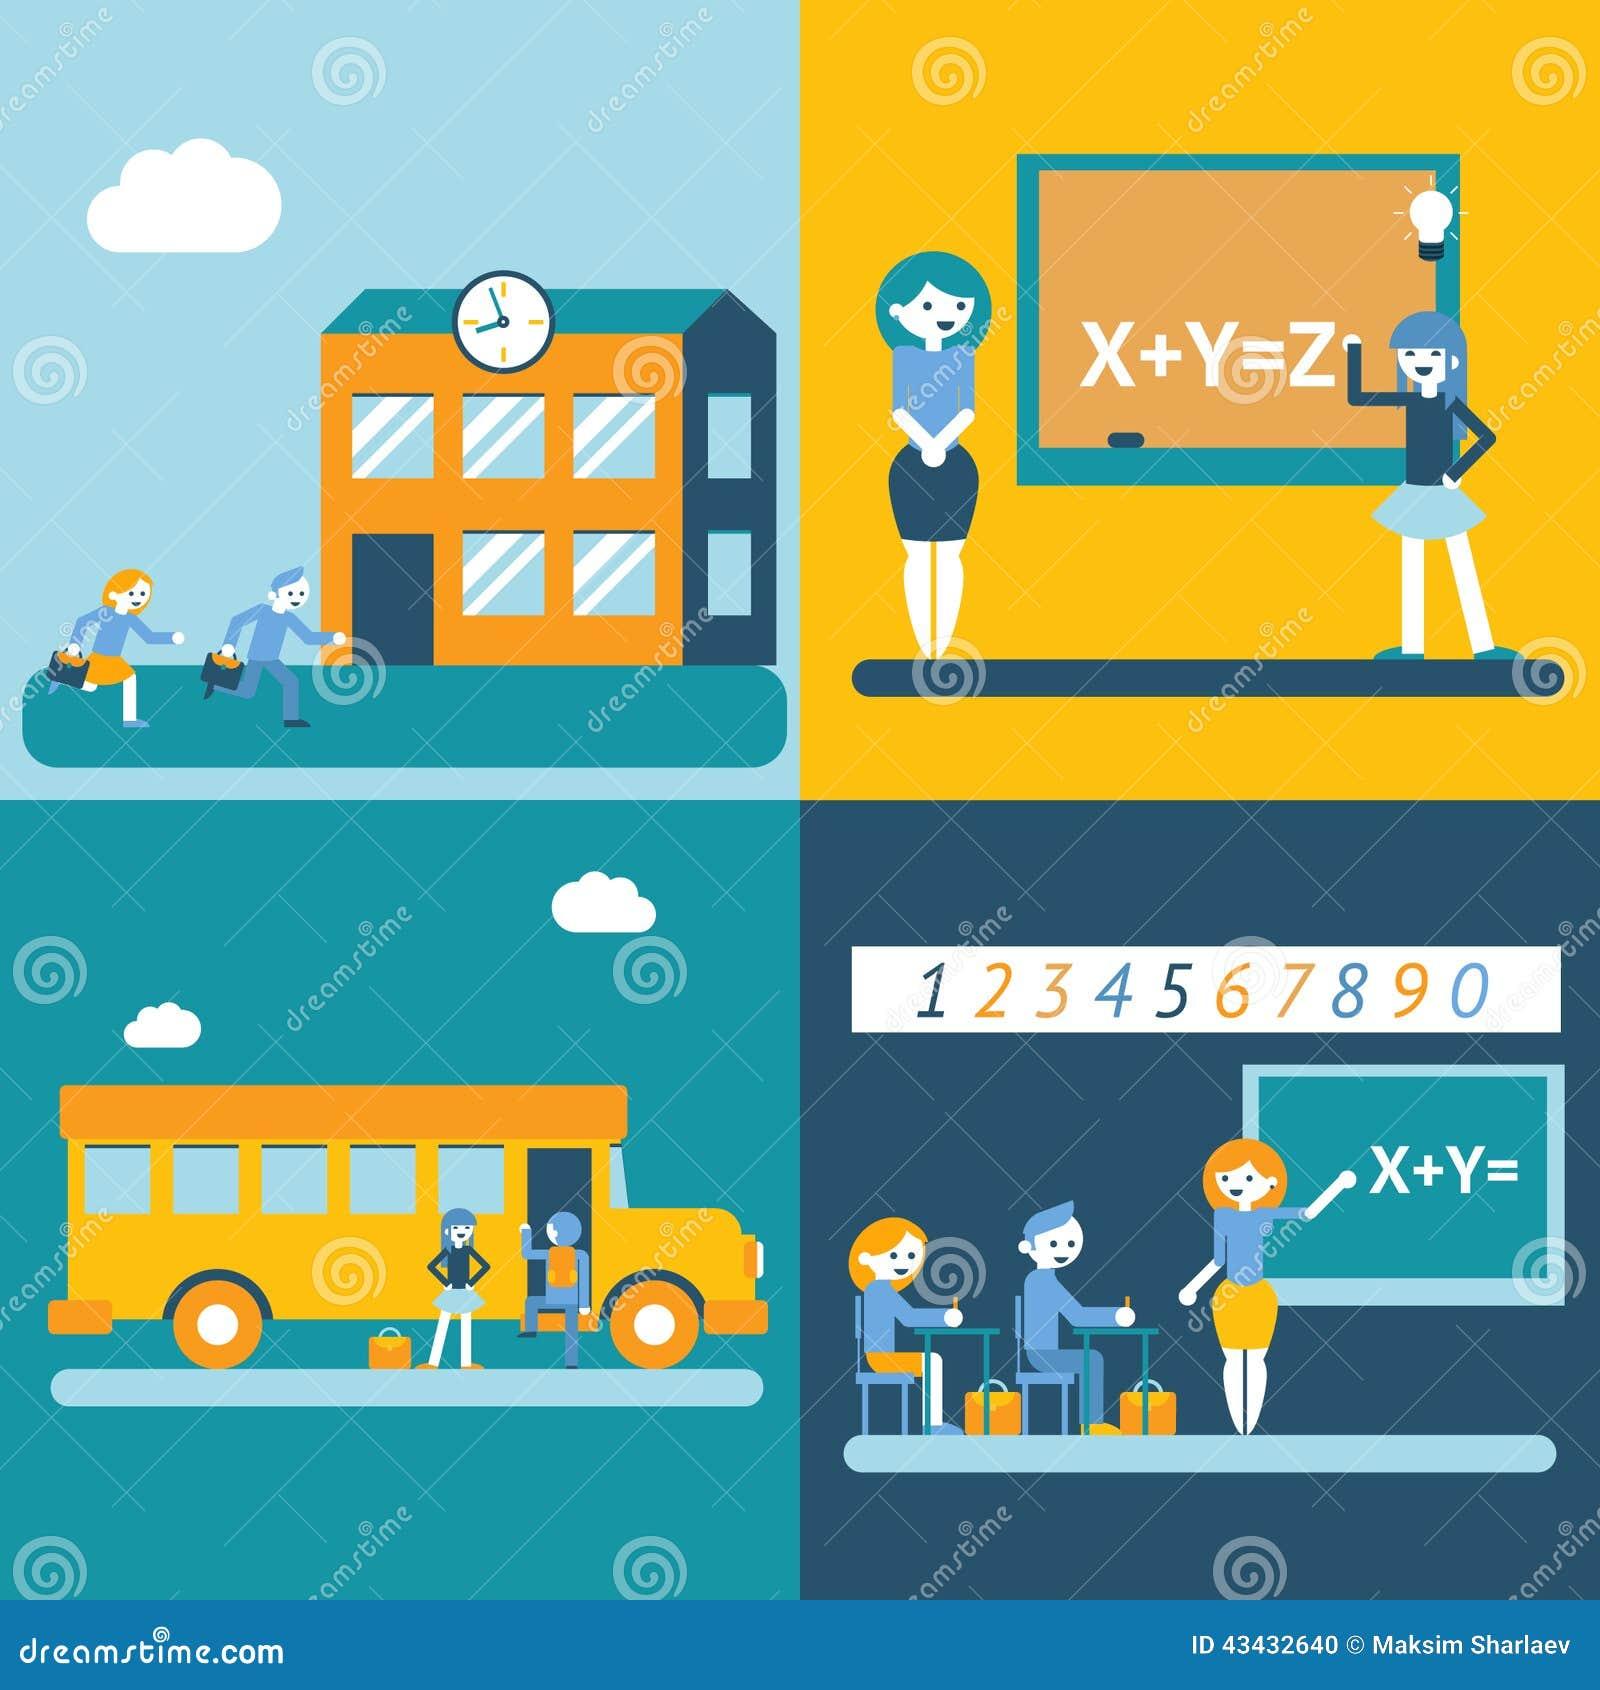 Modern Classroom Vector ~ School character scenes concept icons set modern trendy